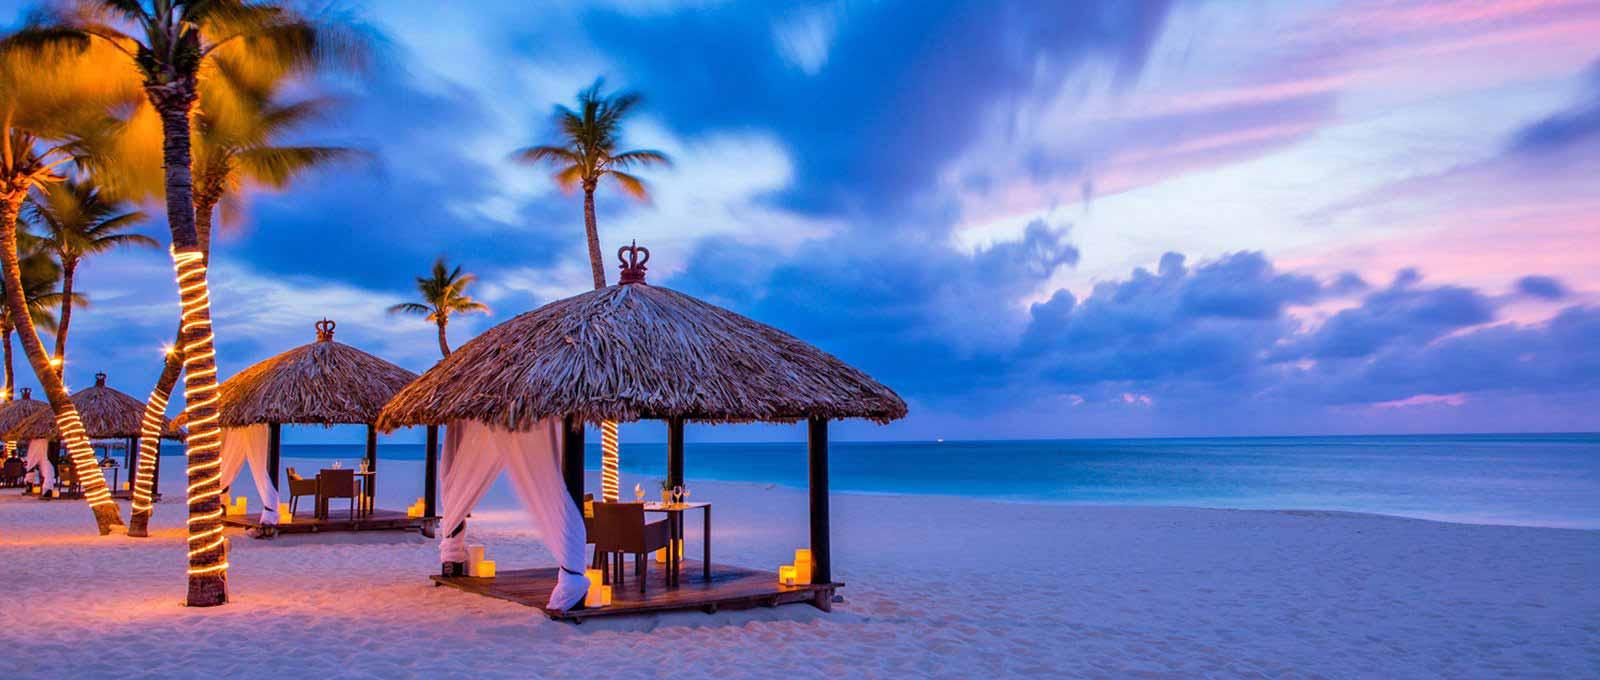 aruba beach shelters dining